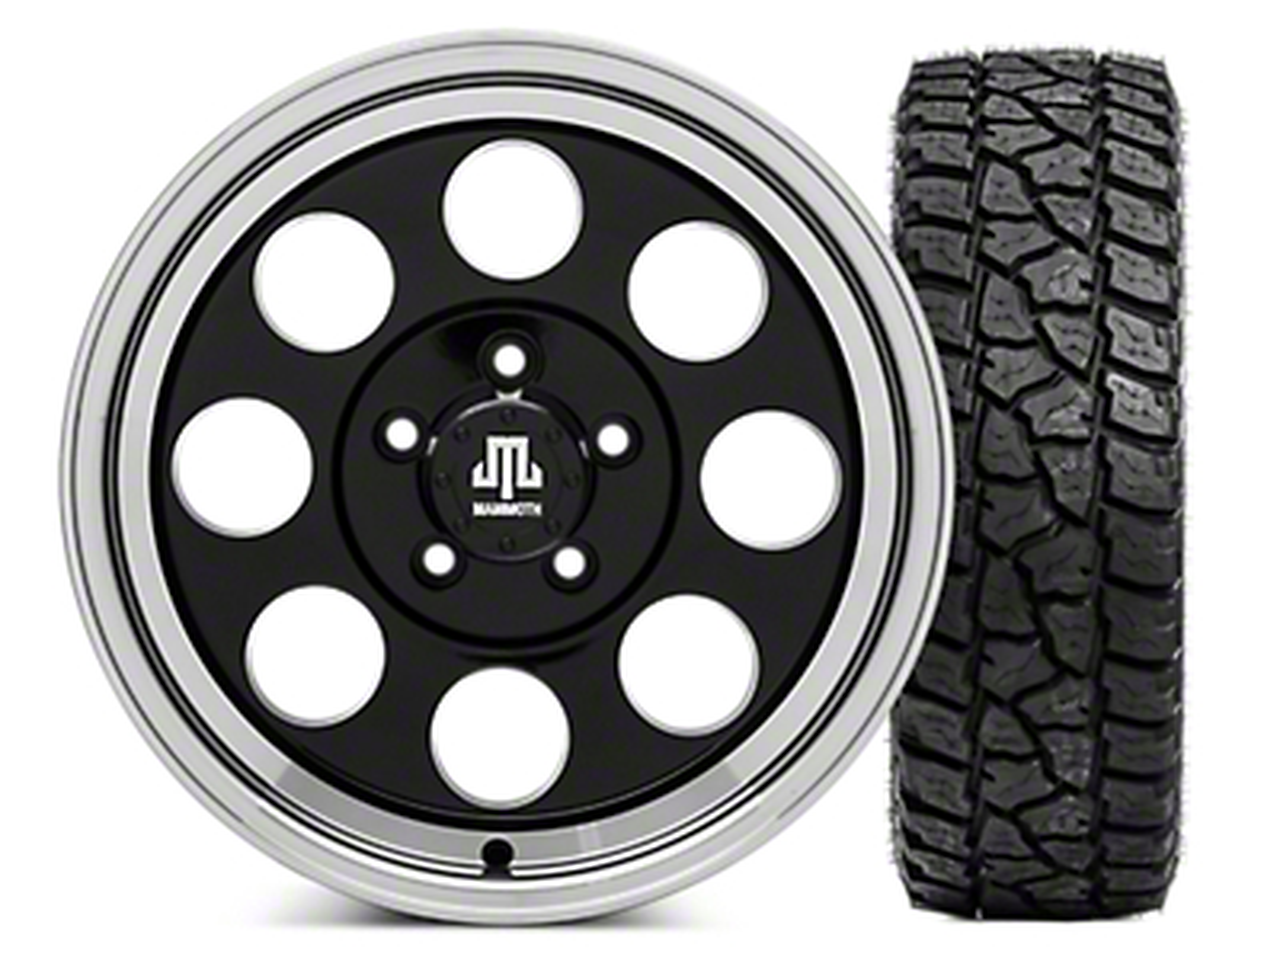 Mammoth 8 16x8 Wheel & Mickey Thompson Baja ATZP3 LT265/75R16 Tire Kit (87-06 Jeep Wrangler YJ & TJ)